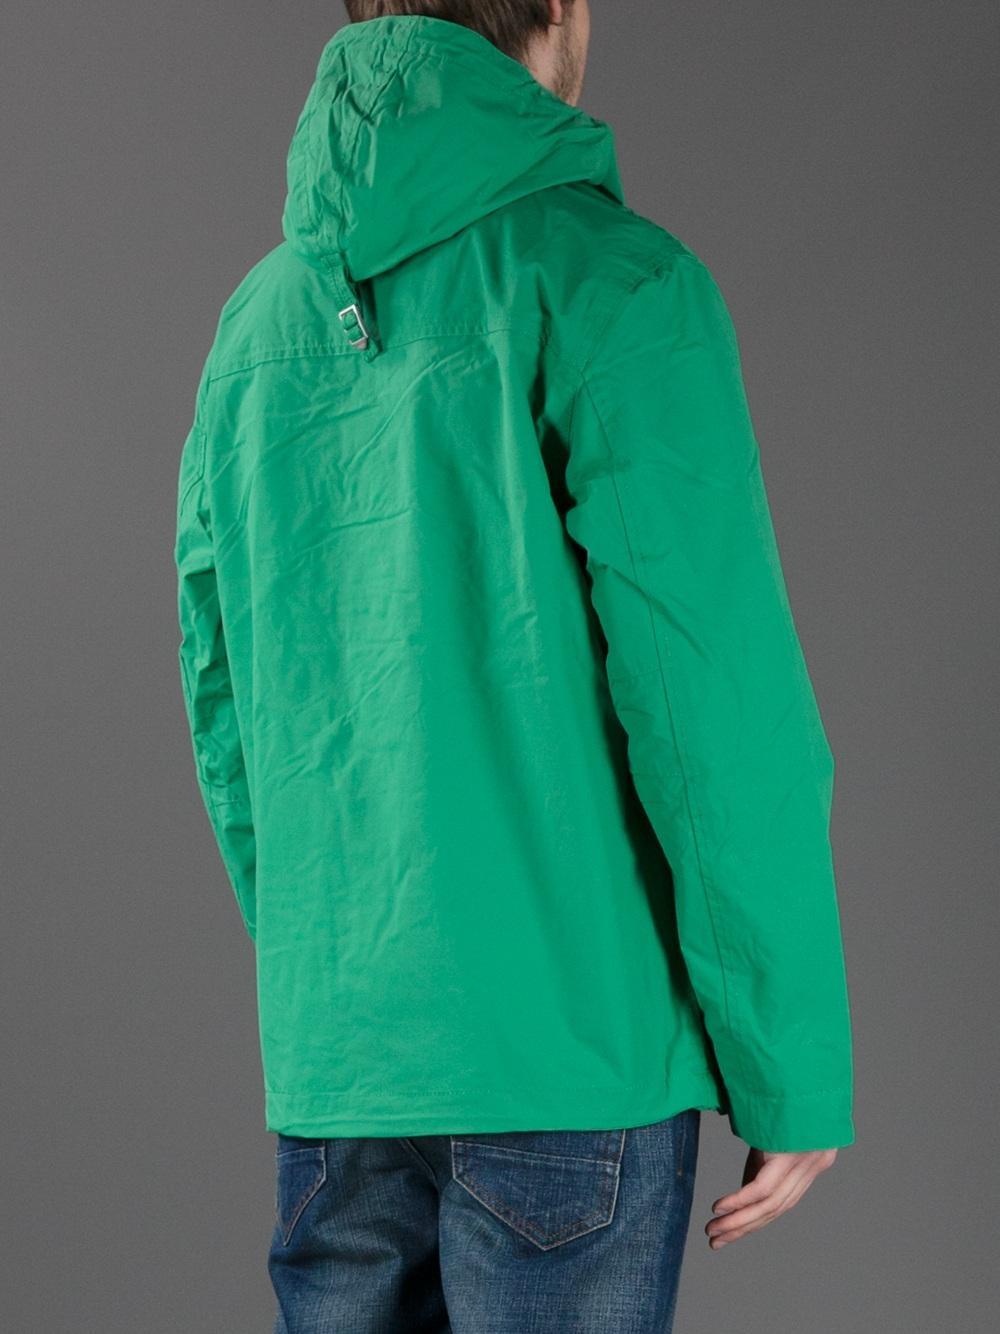 Lyst Napapijri Rainforest Jacket In Green For Men